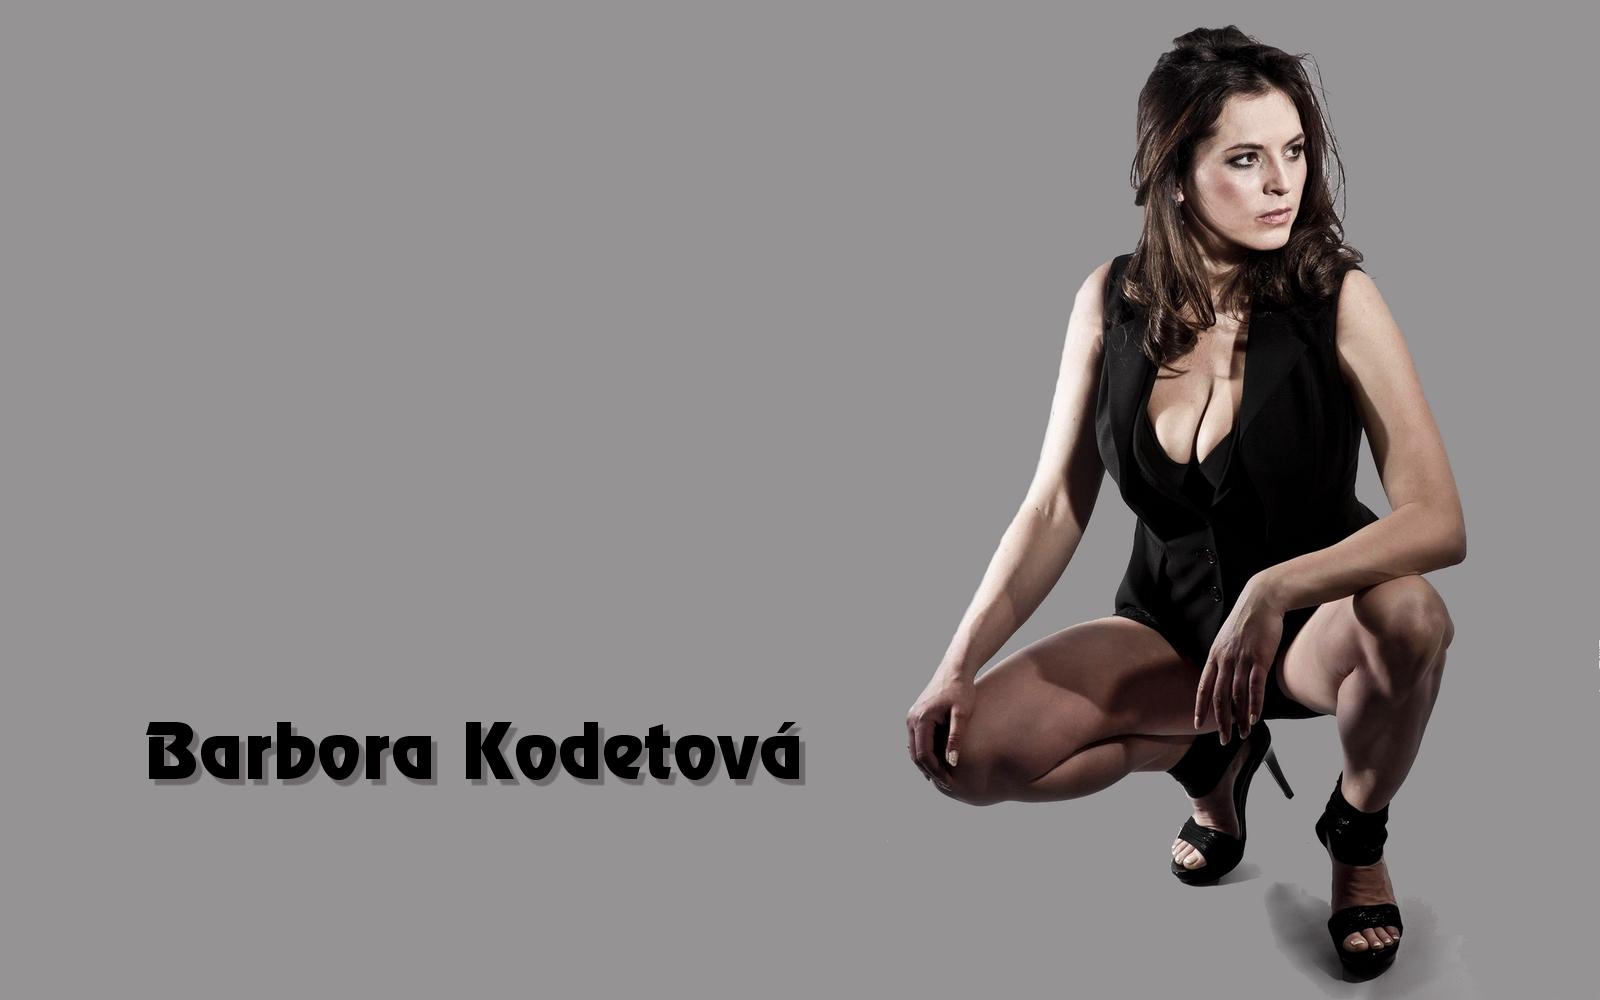 http://4.bp.blogspot.com/-meCobpoePow/UJASrrJrvII/AAAAAAAGIwY/vAf6wdSbf0g/s1600/Barbora%2BKodetova%2BWallpaper%2B06.jpg